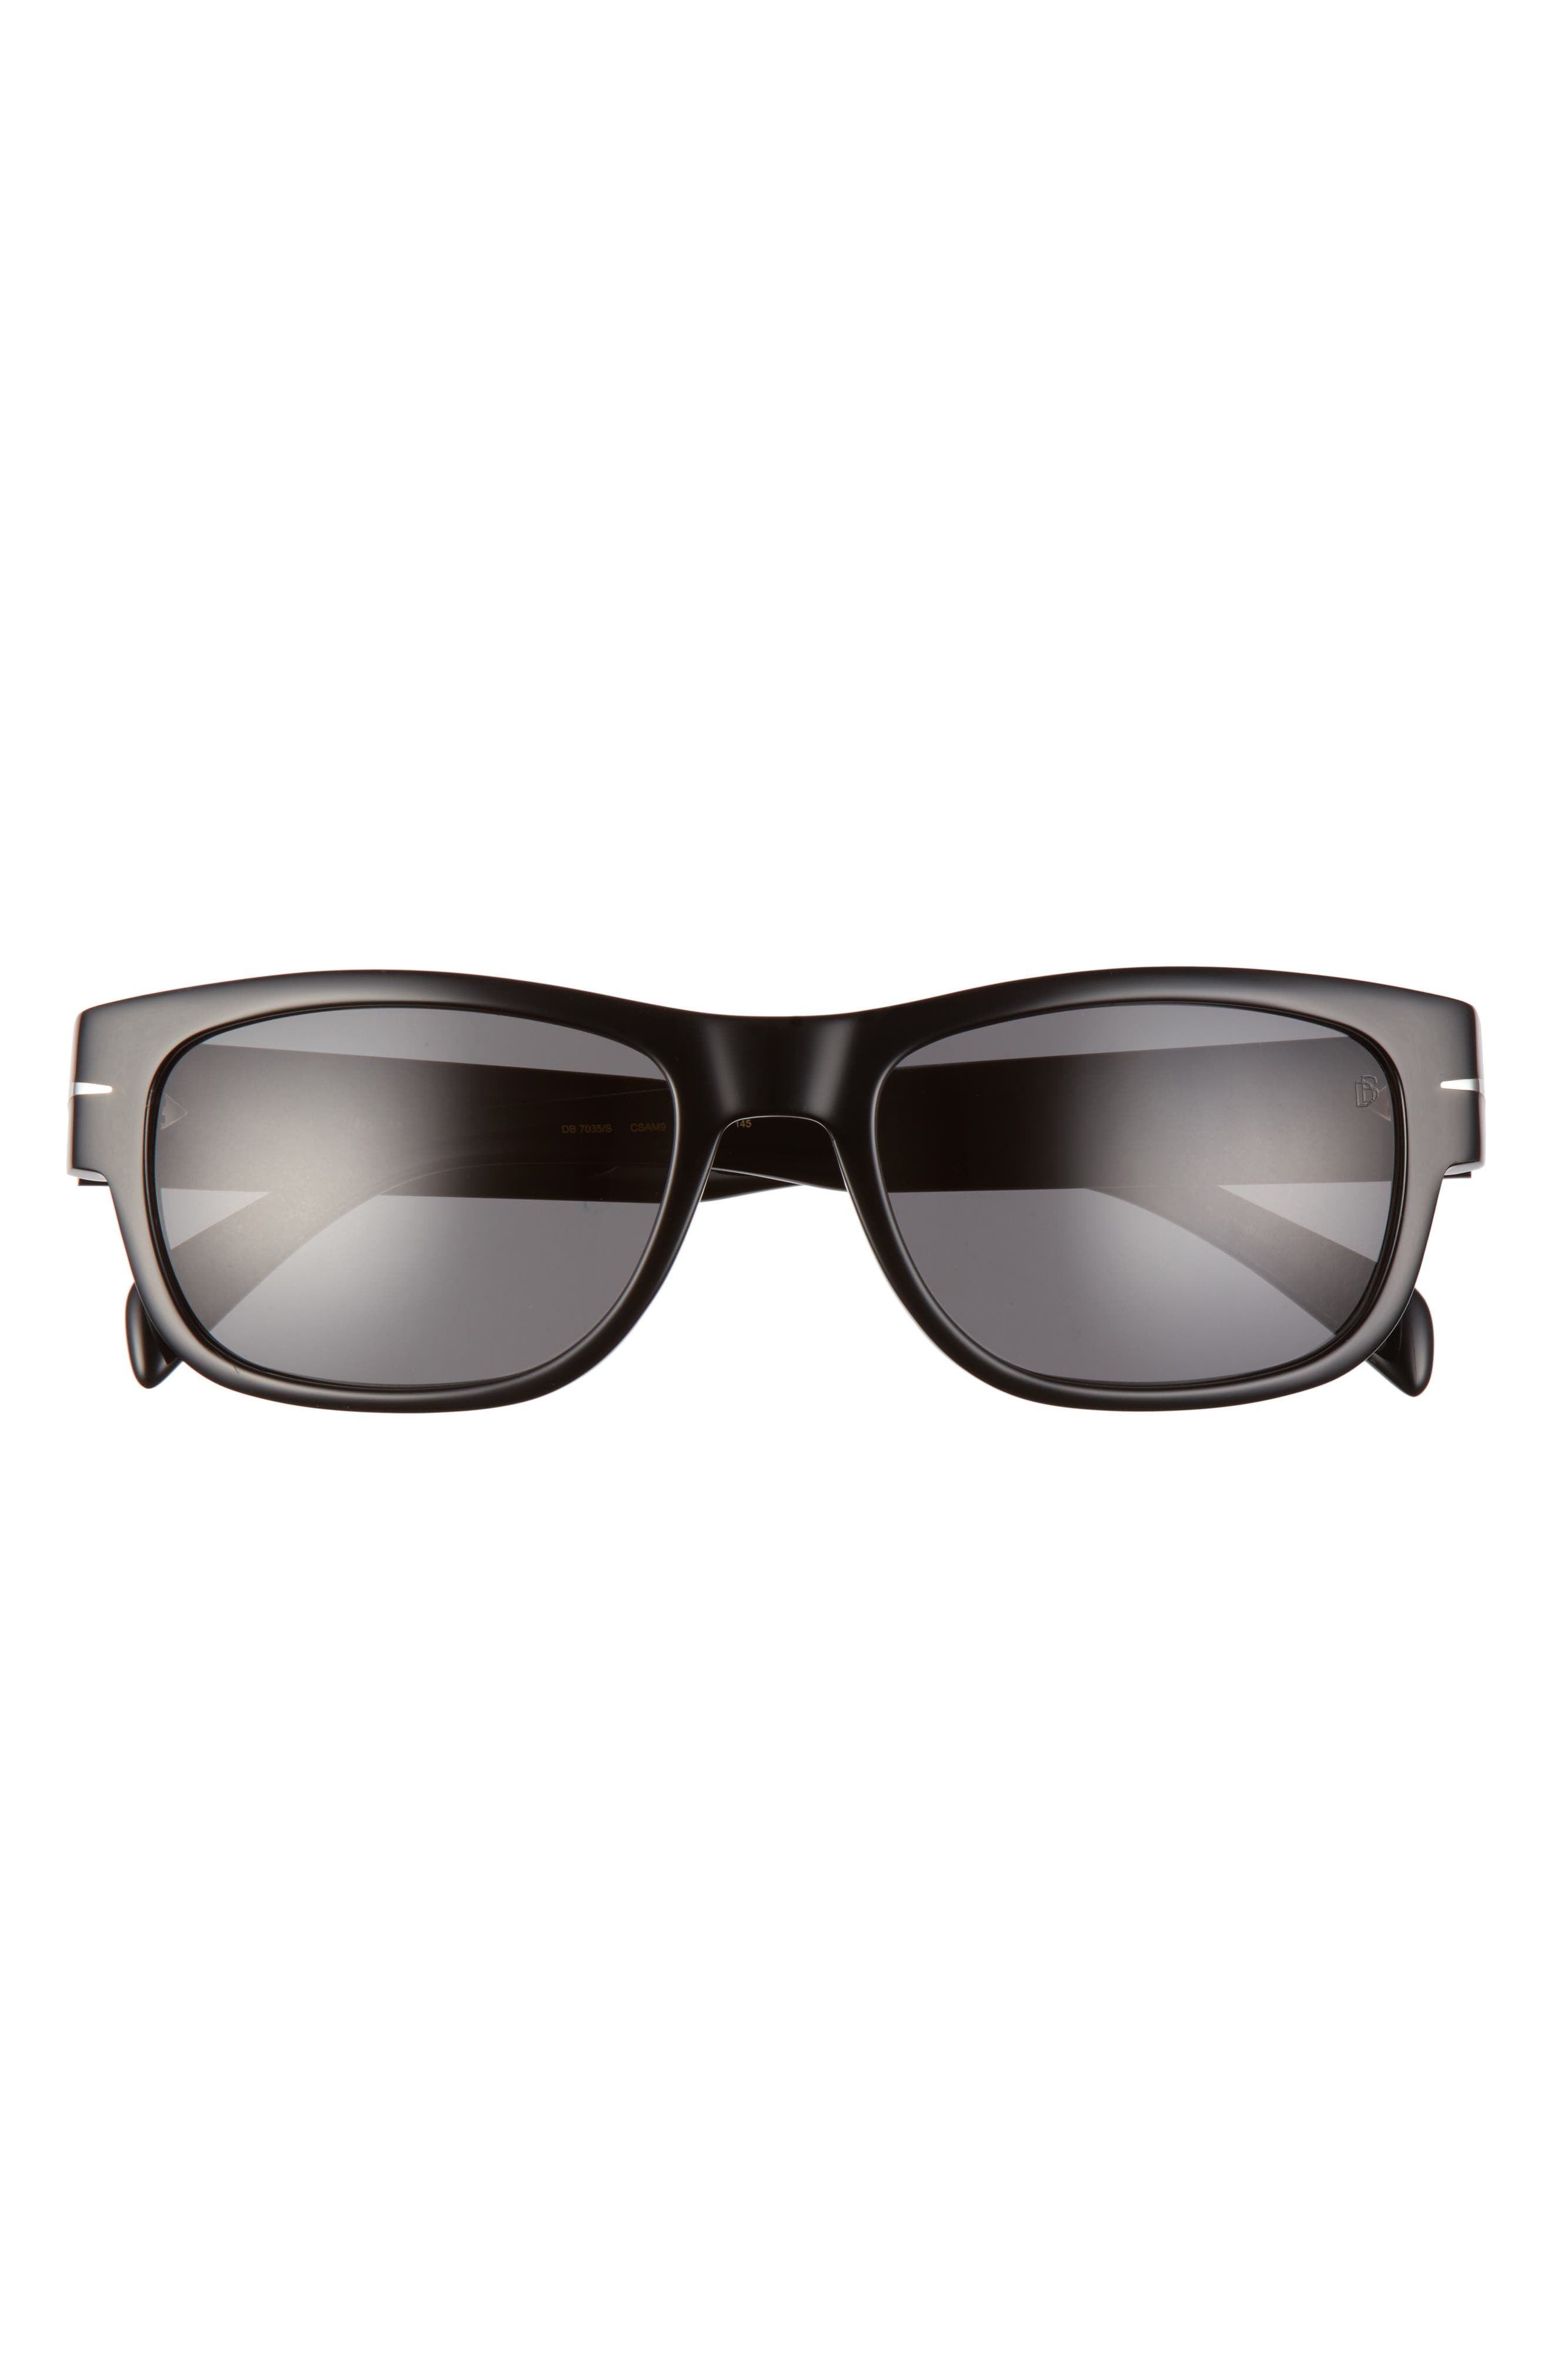 Men's Eyewear By David Beckham 56mm Polarized Rectangular Sunglasses